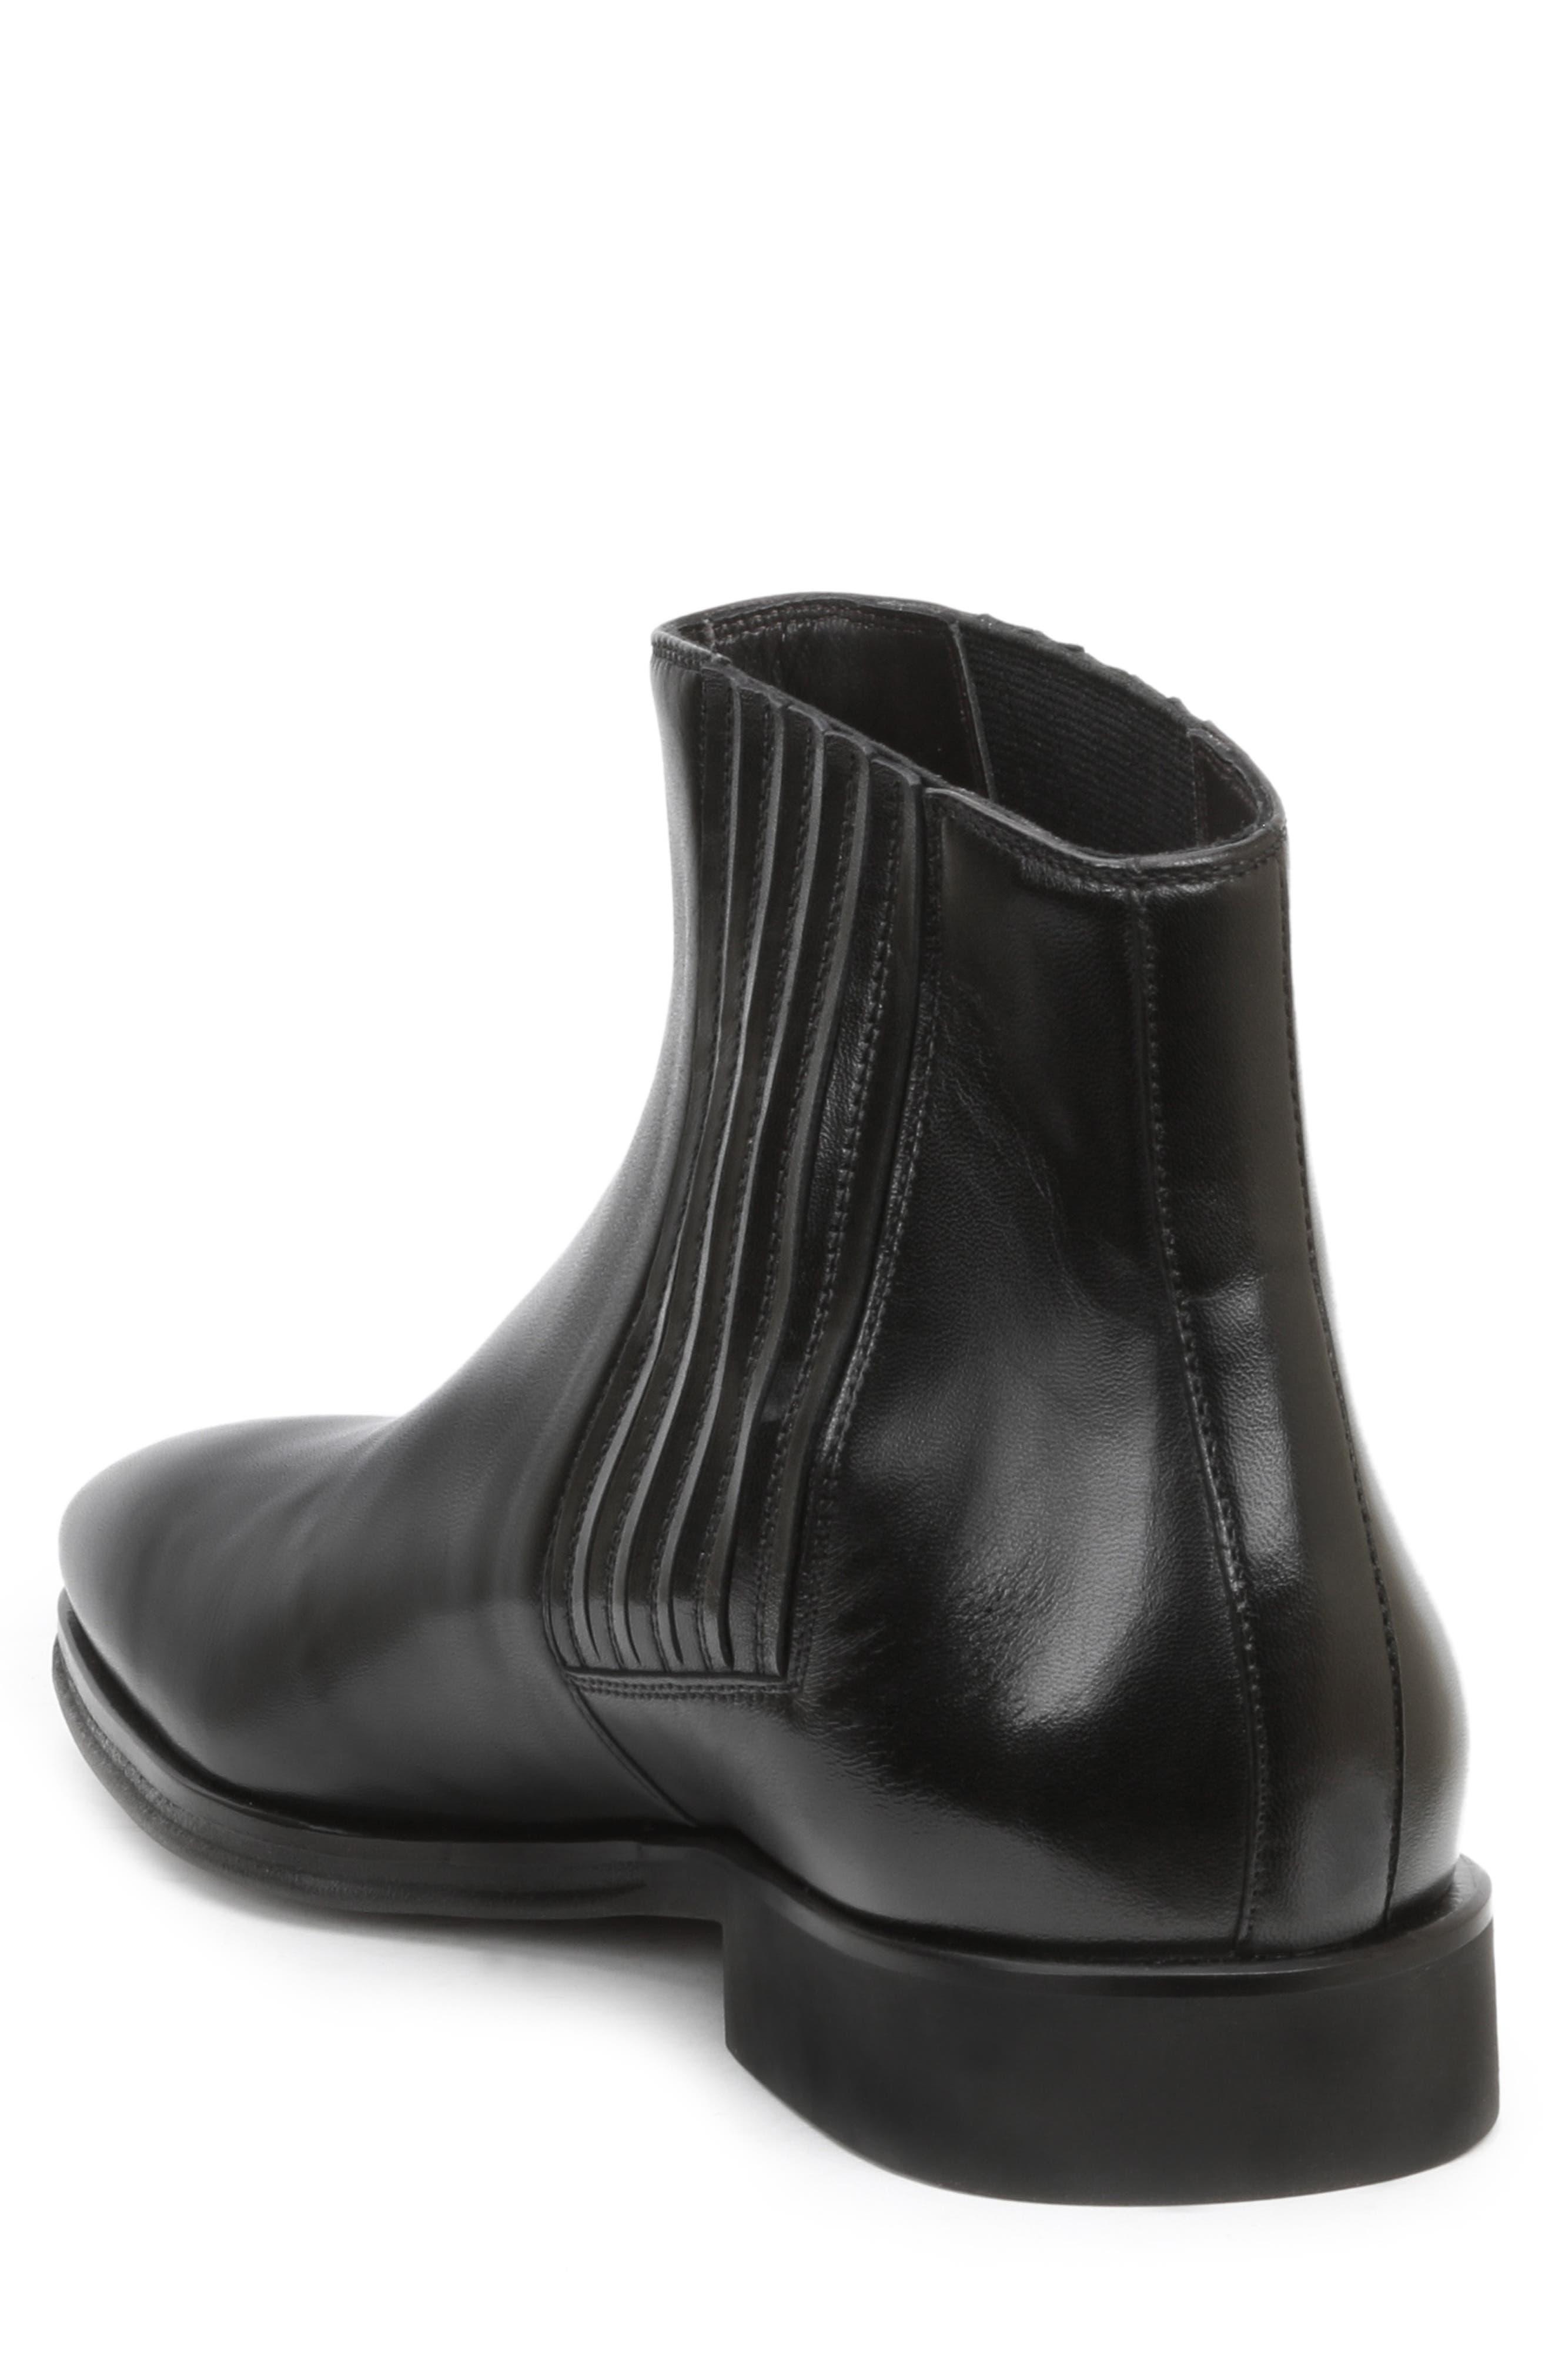 BRUNO MAGLI, Rezzo Chelsea Boot, Alternate thumbnail 2, color, BLACK